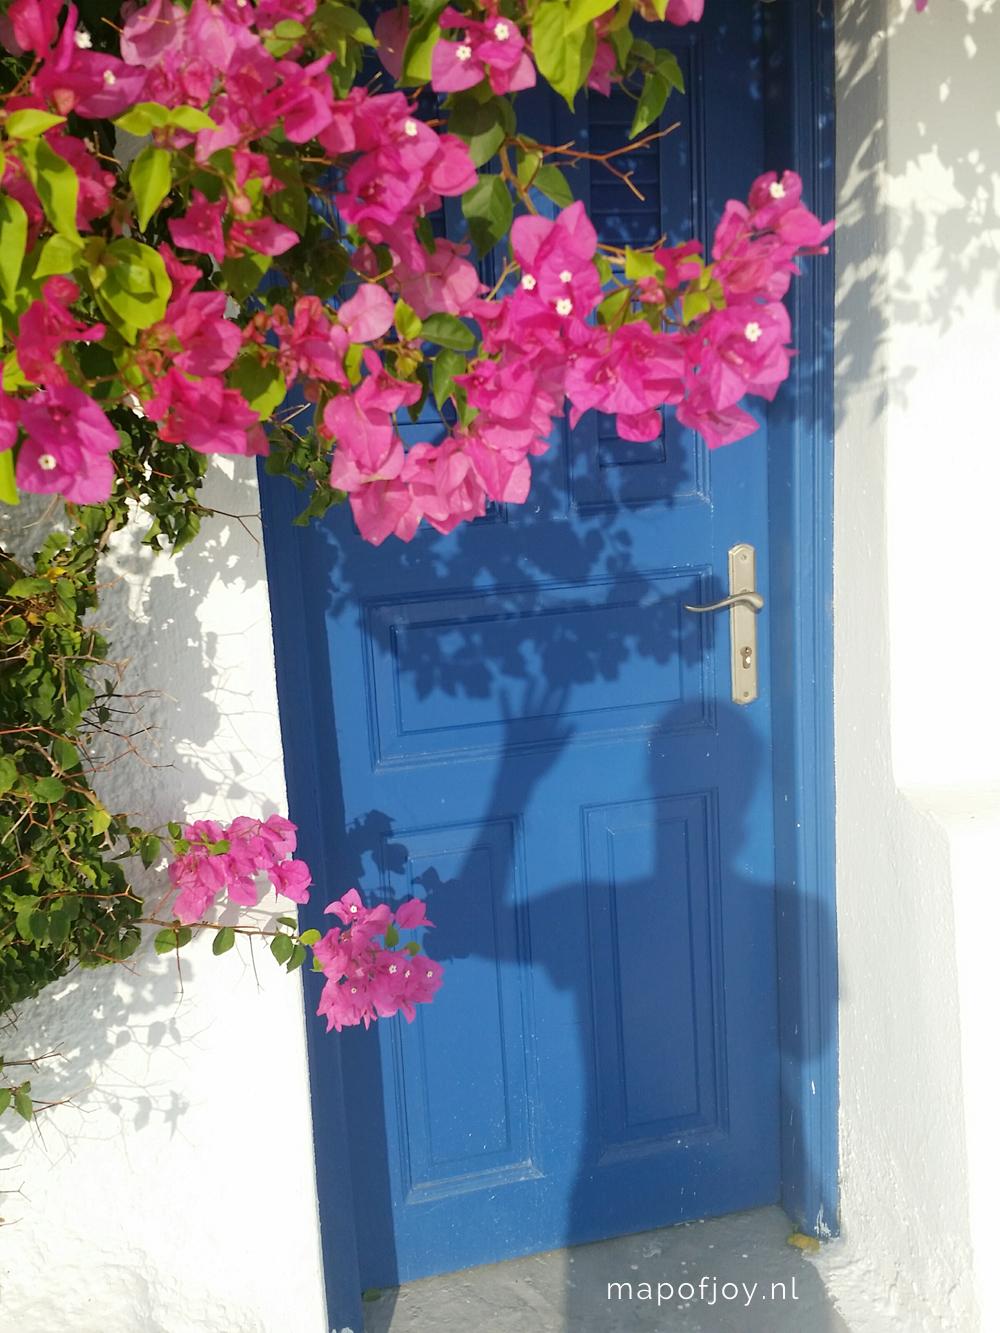 Santorini Greece, bougainville - Map of Joy